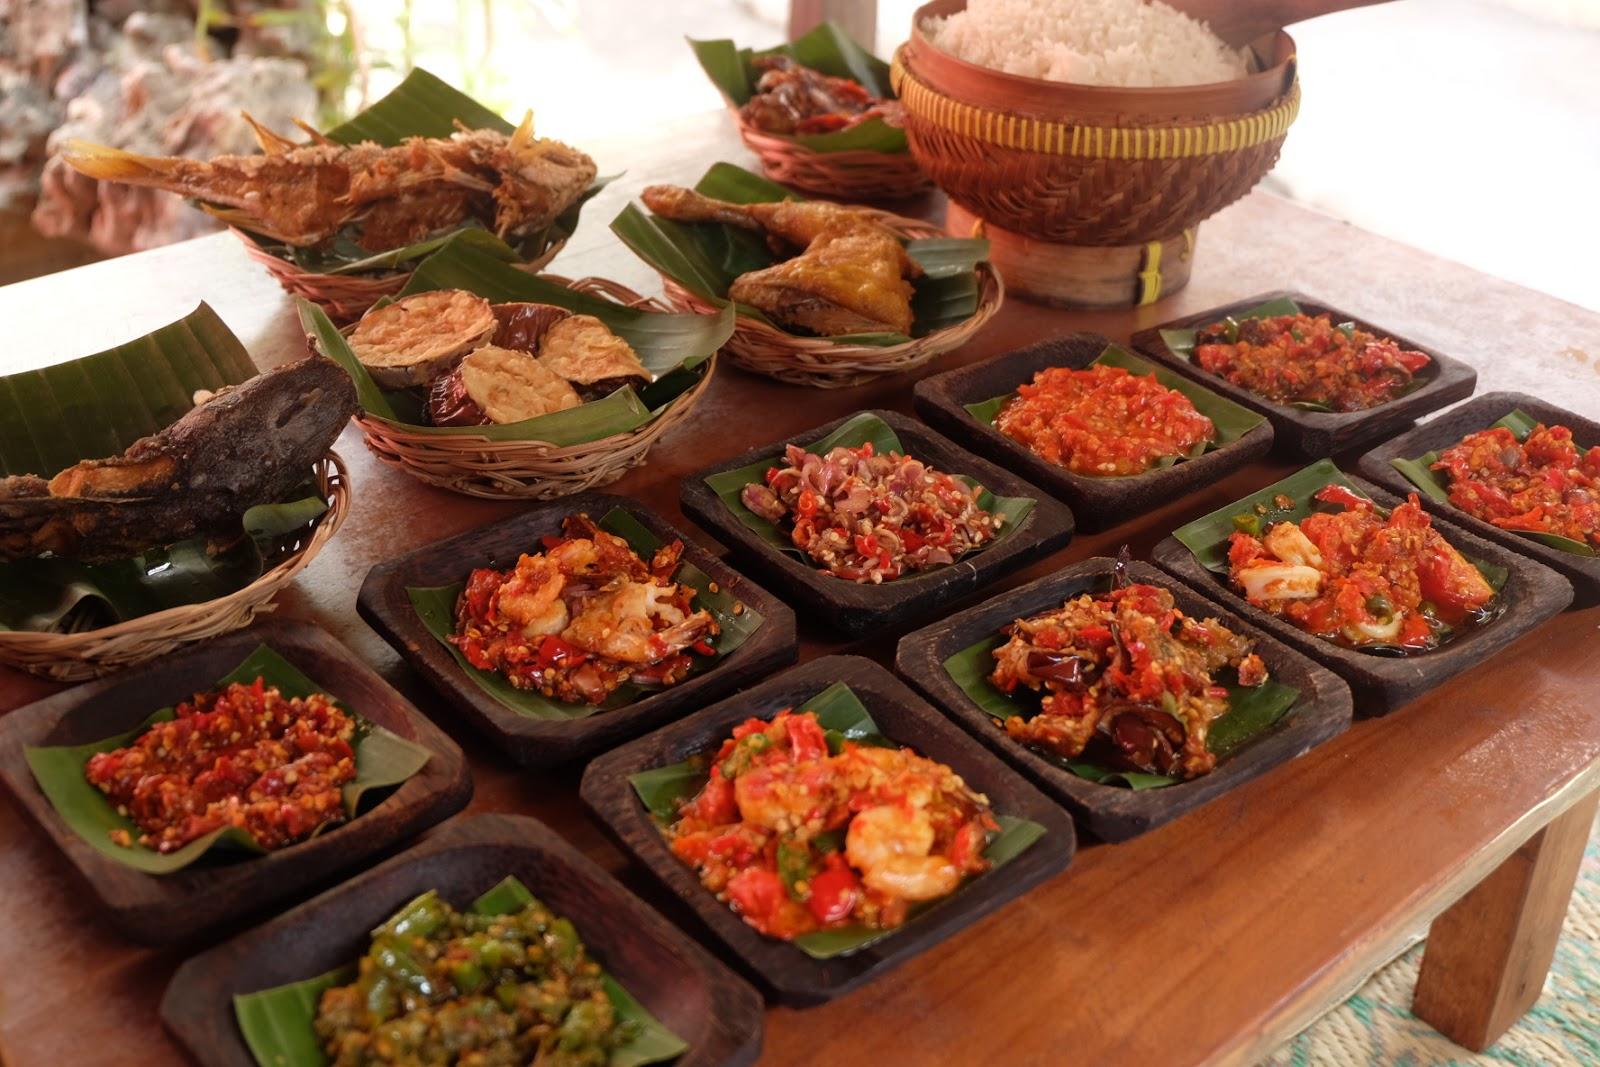 Tempat Makan Sambal Khas Bali Enak Murah Nyaman Di Denpasar Nasi Bandeng Presto Box By Susenopresto Semua Menu Dsambal Halal Harga Mulai 2000